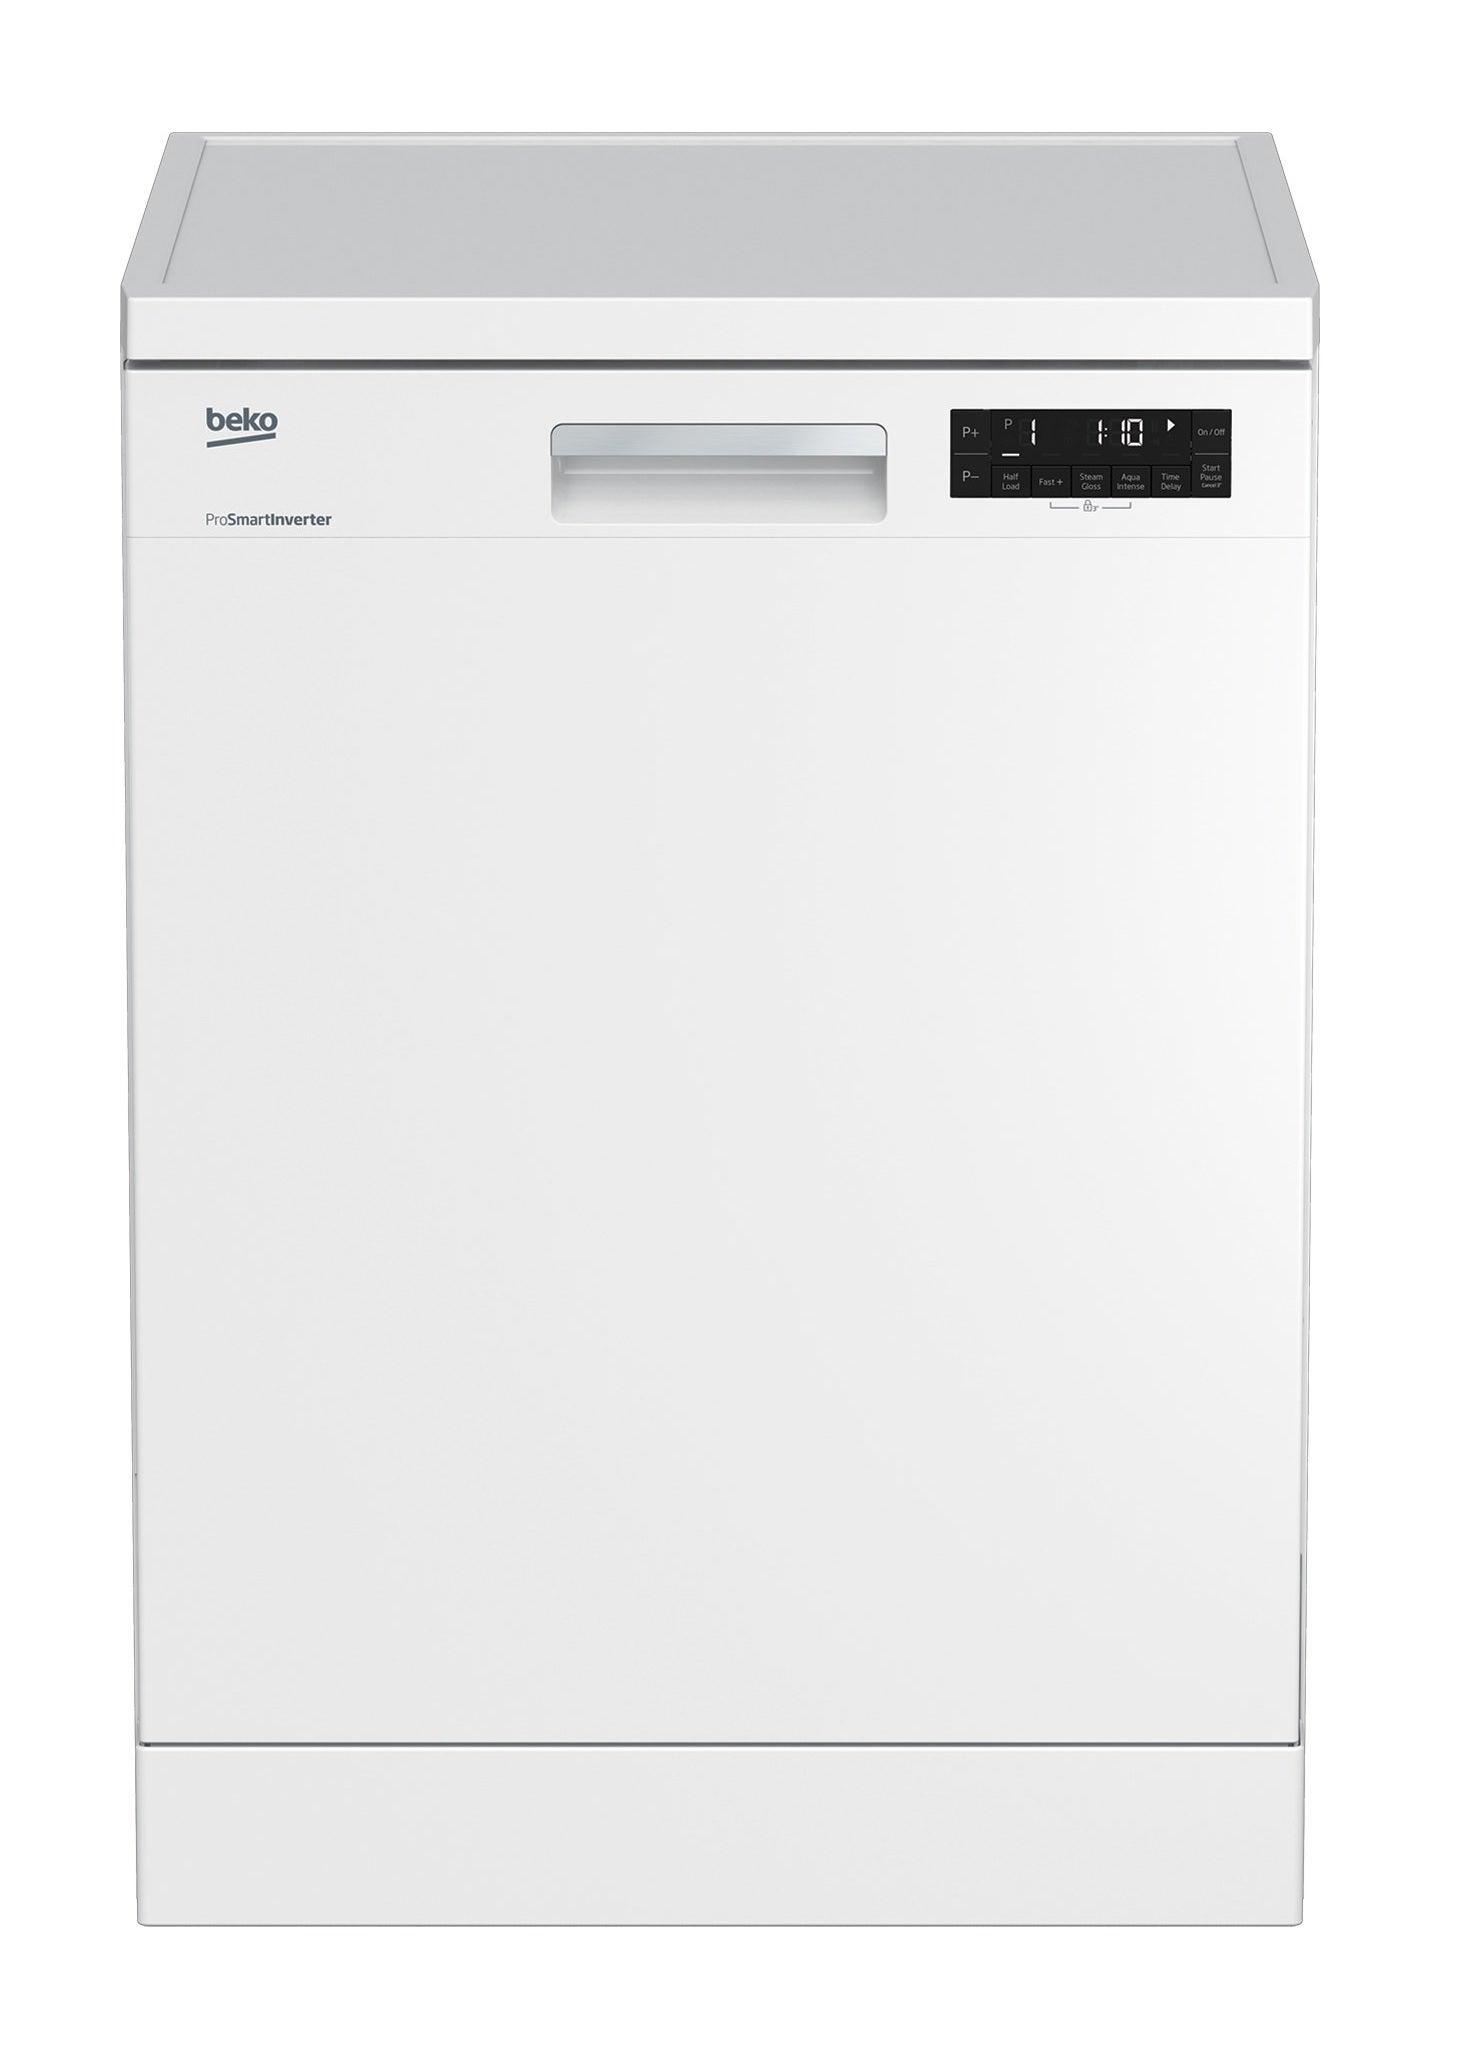 Beko BDF1620W Dishwasher